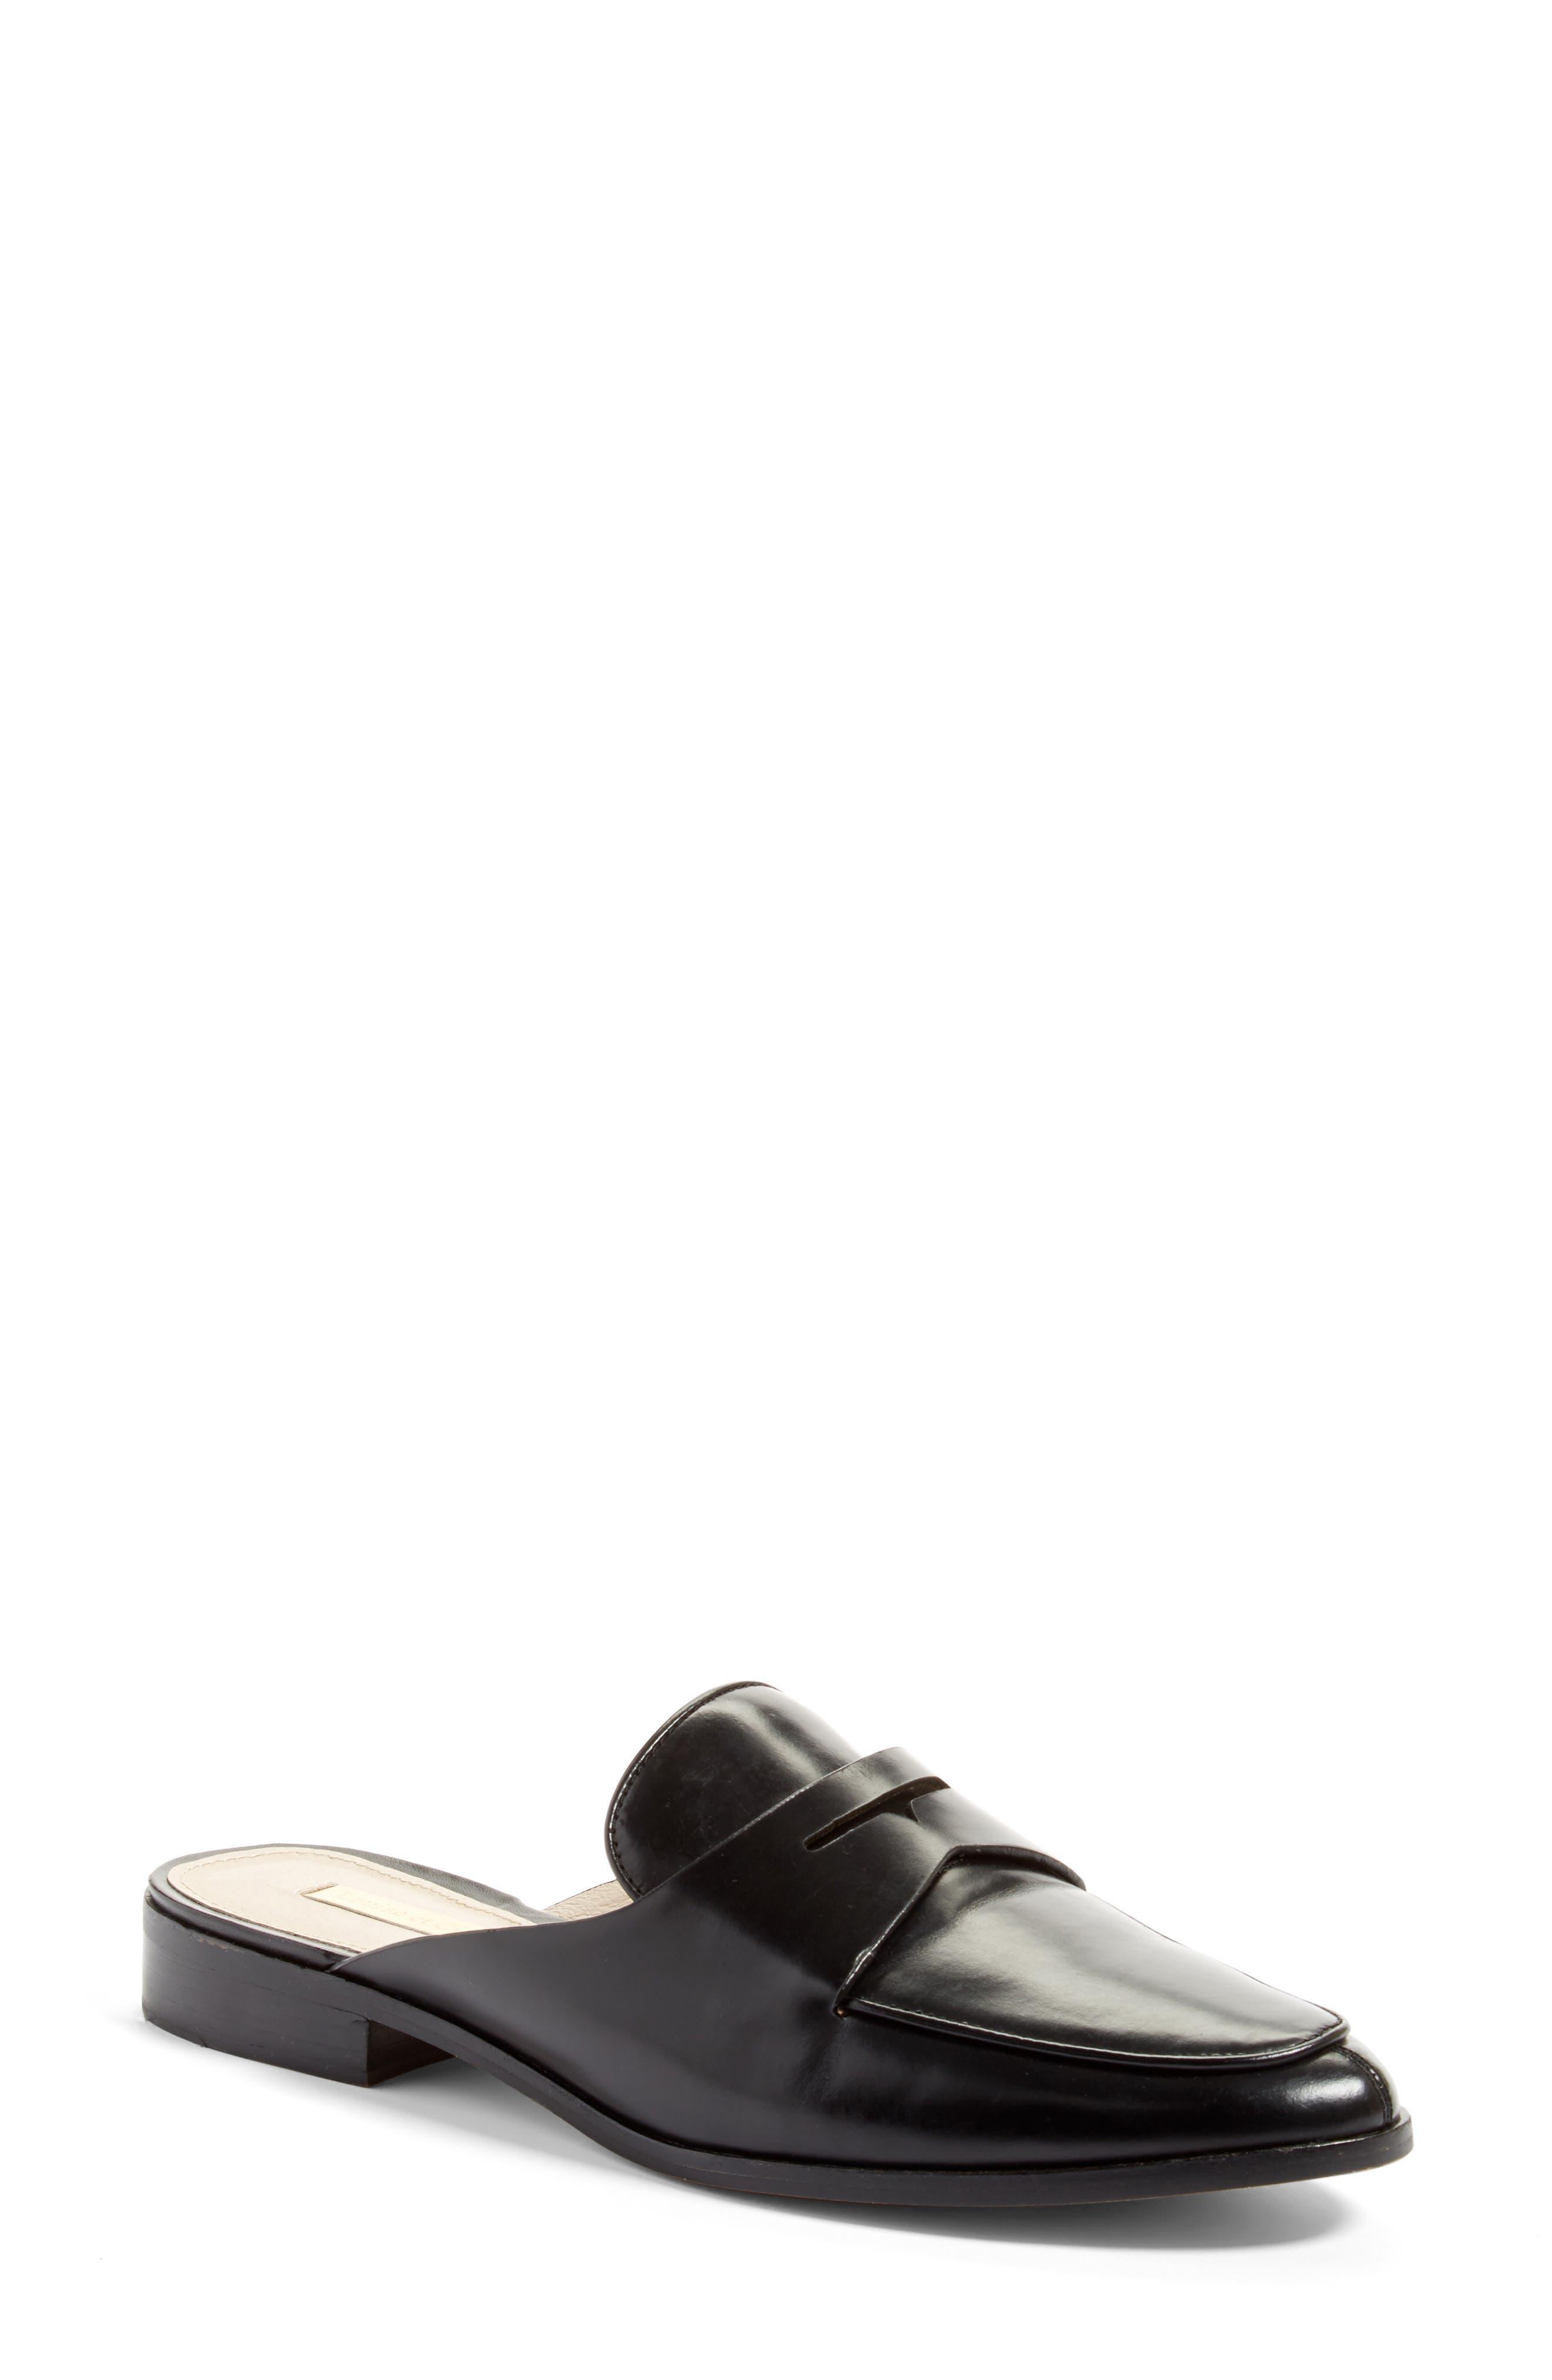 Dugan Flat Loafer Mule,                         Main,                         color, Black Leather